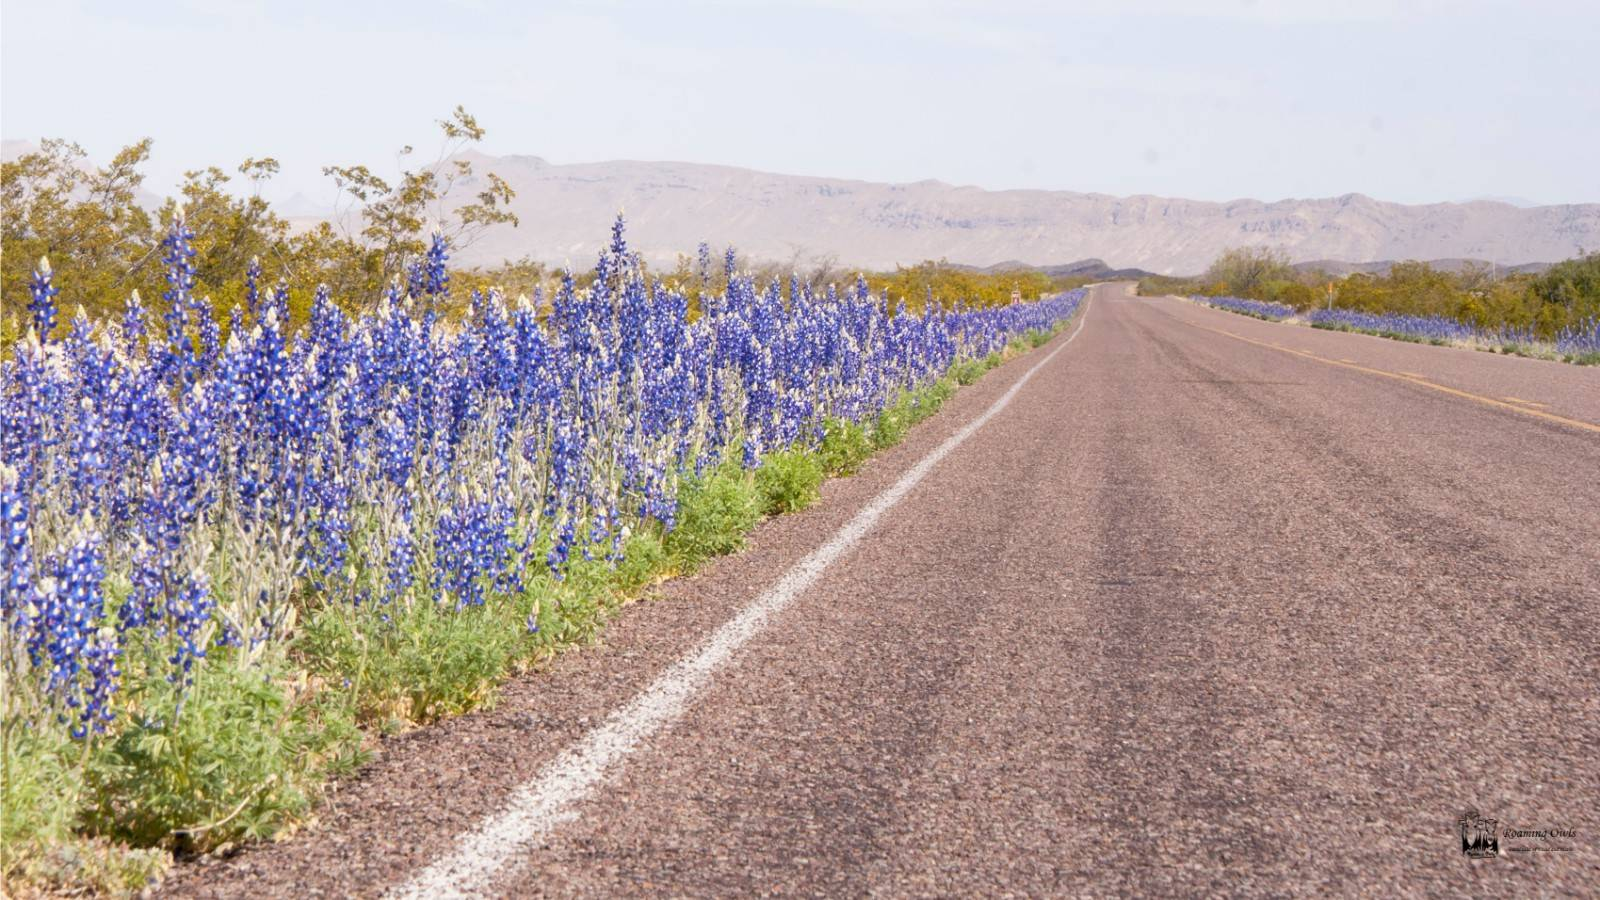 Lupine,blue flowers,big bend national park,texas,Big bend bluebonnet,Lupinus havardi